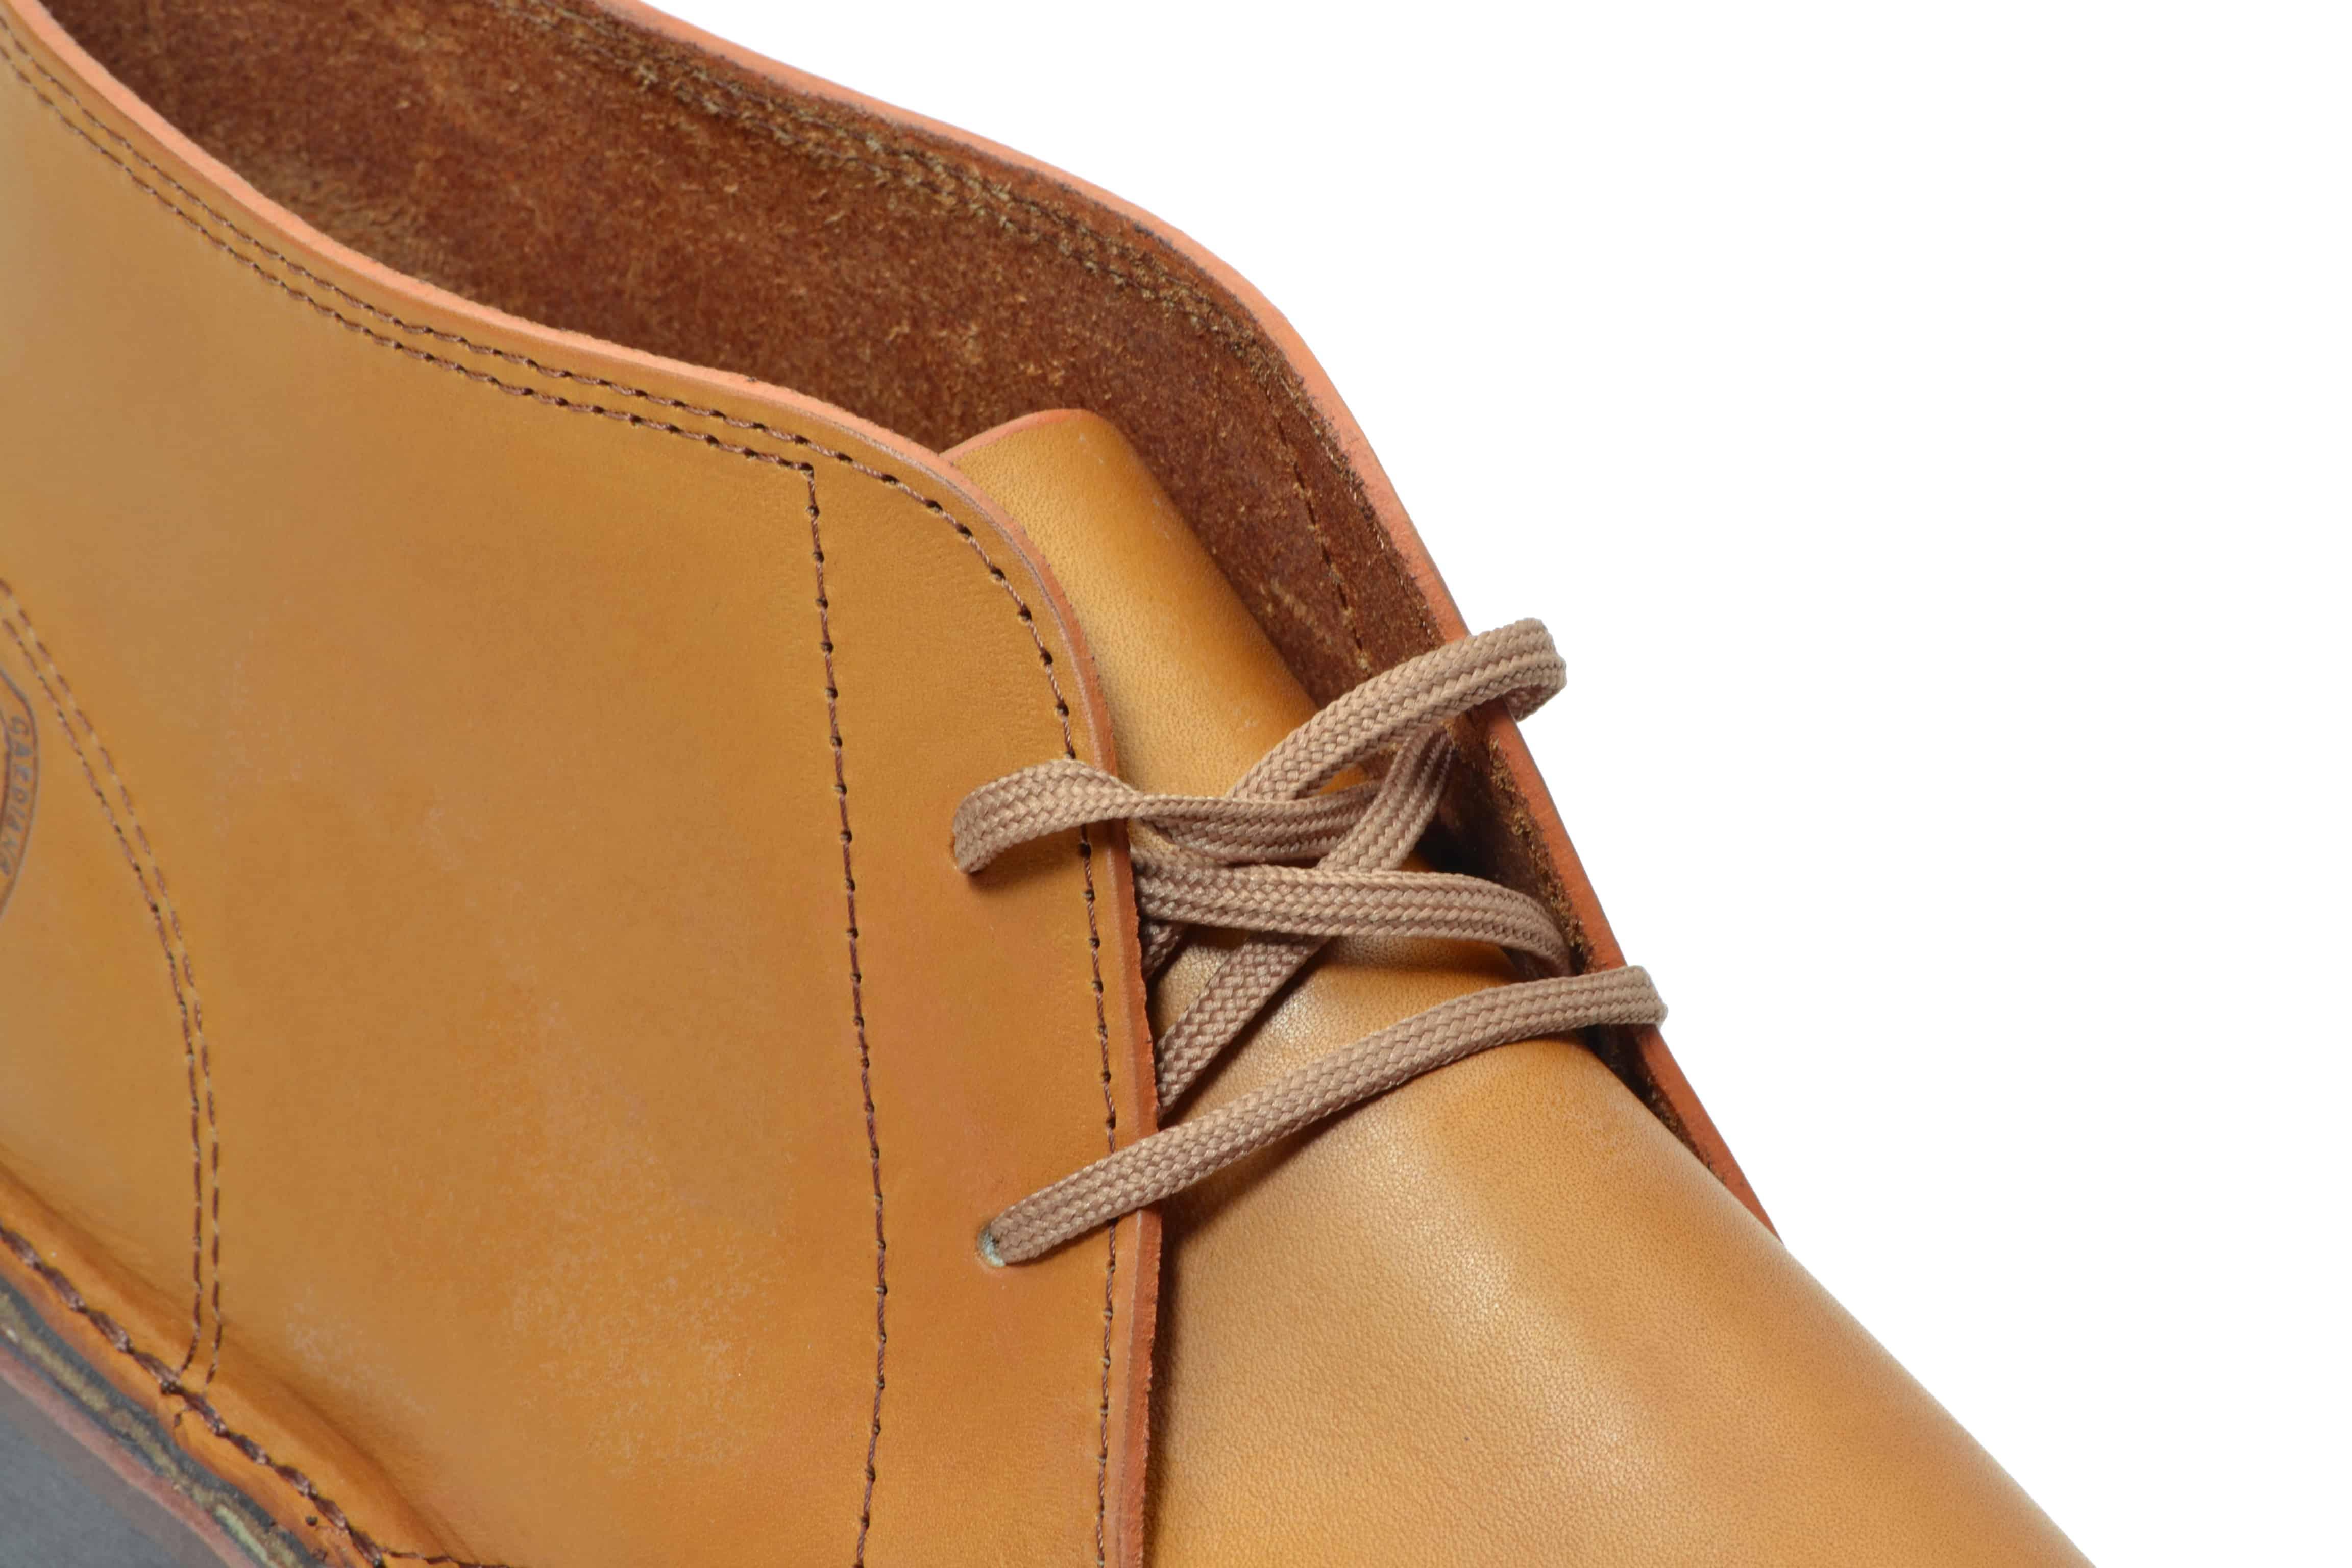 Homme Naturel Homme Chaussures Cuir Cuir Chaussures Camargue Camargue lKFTcJ31